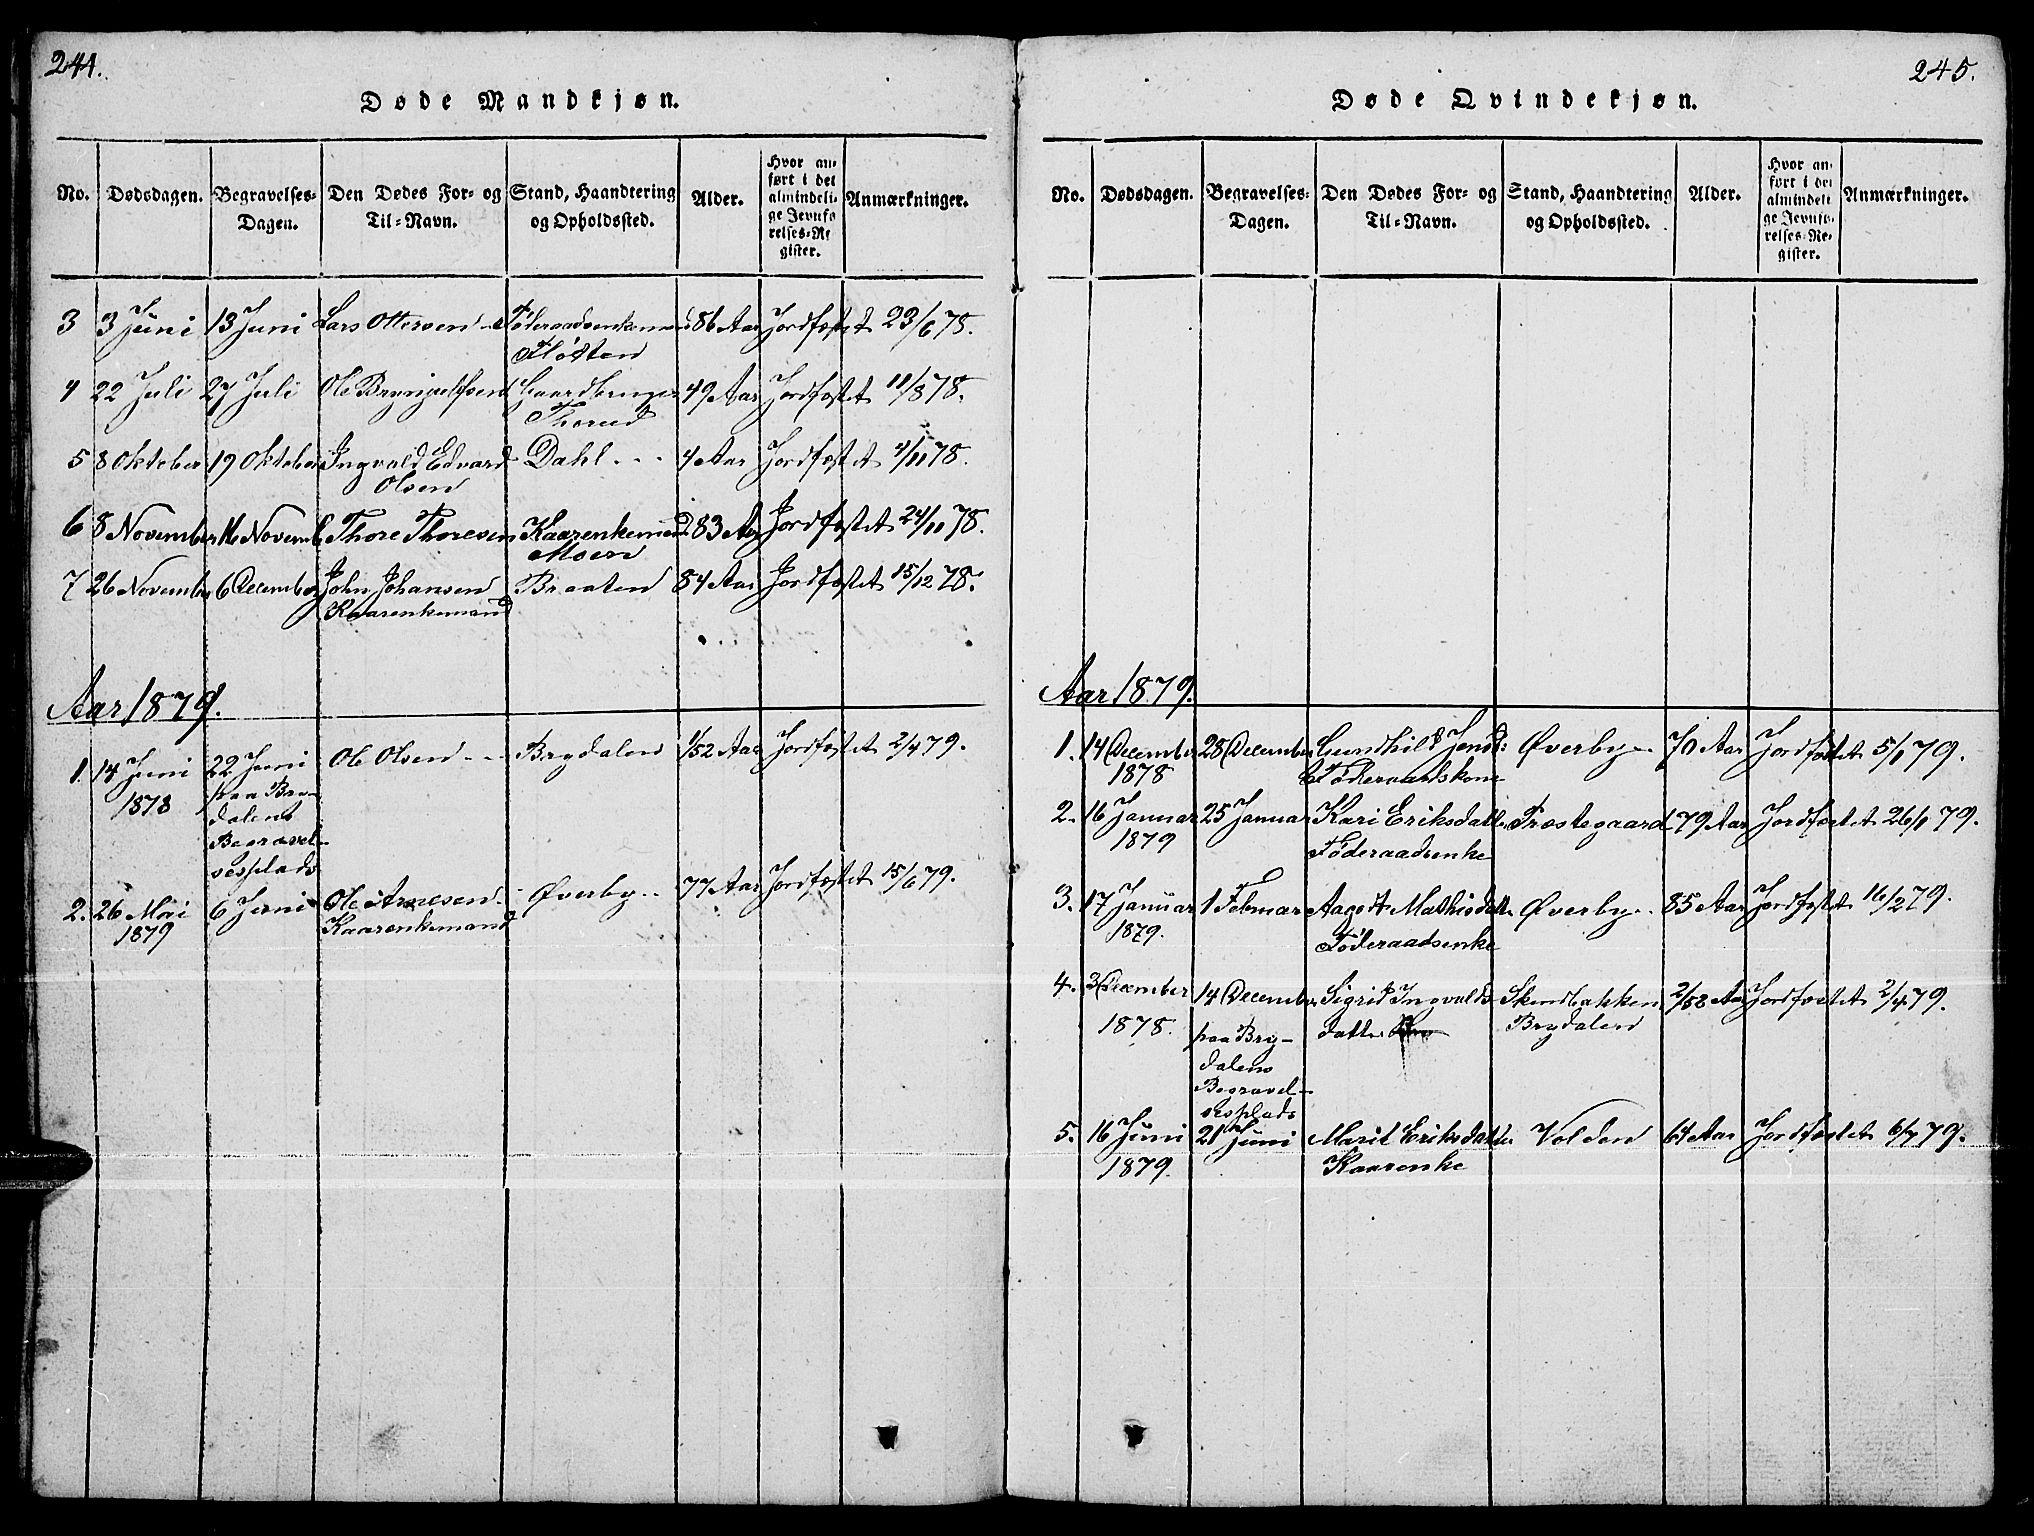 SAH, Tynset prestekontor, Klokkerbok nr. 4, 1814-1879, s. 244-245